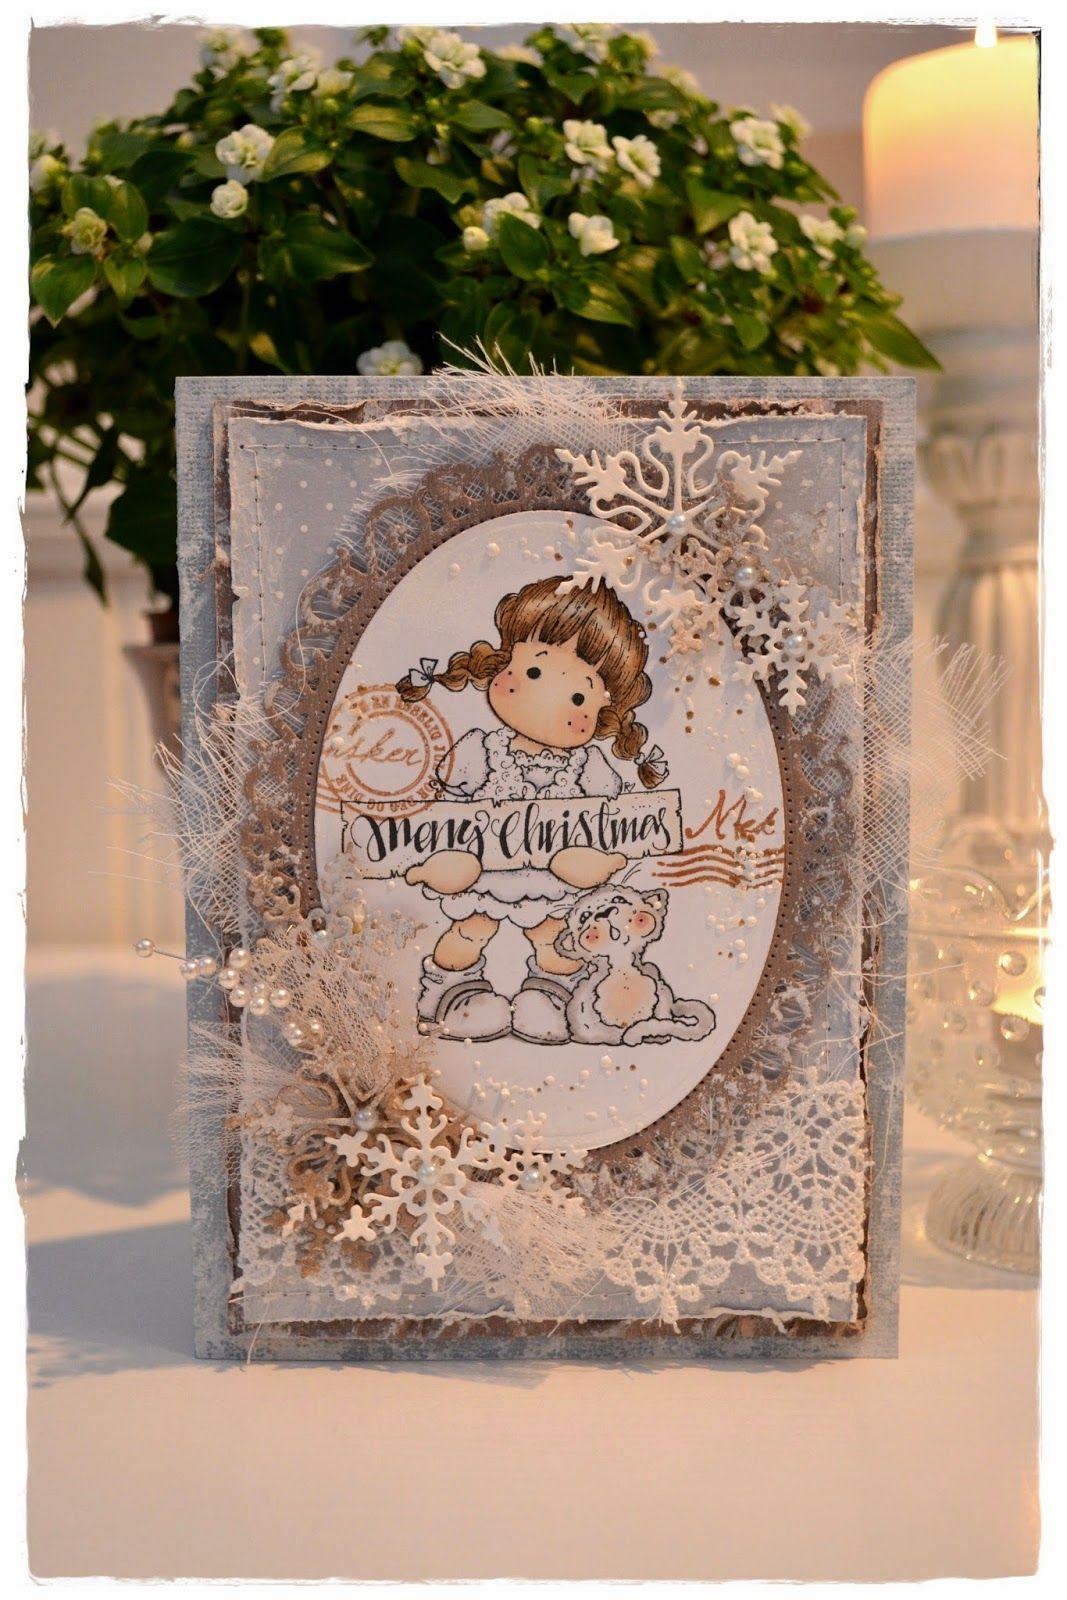 Gro's kort og sånnt: Julekort